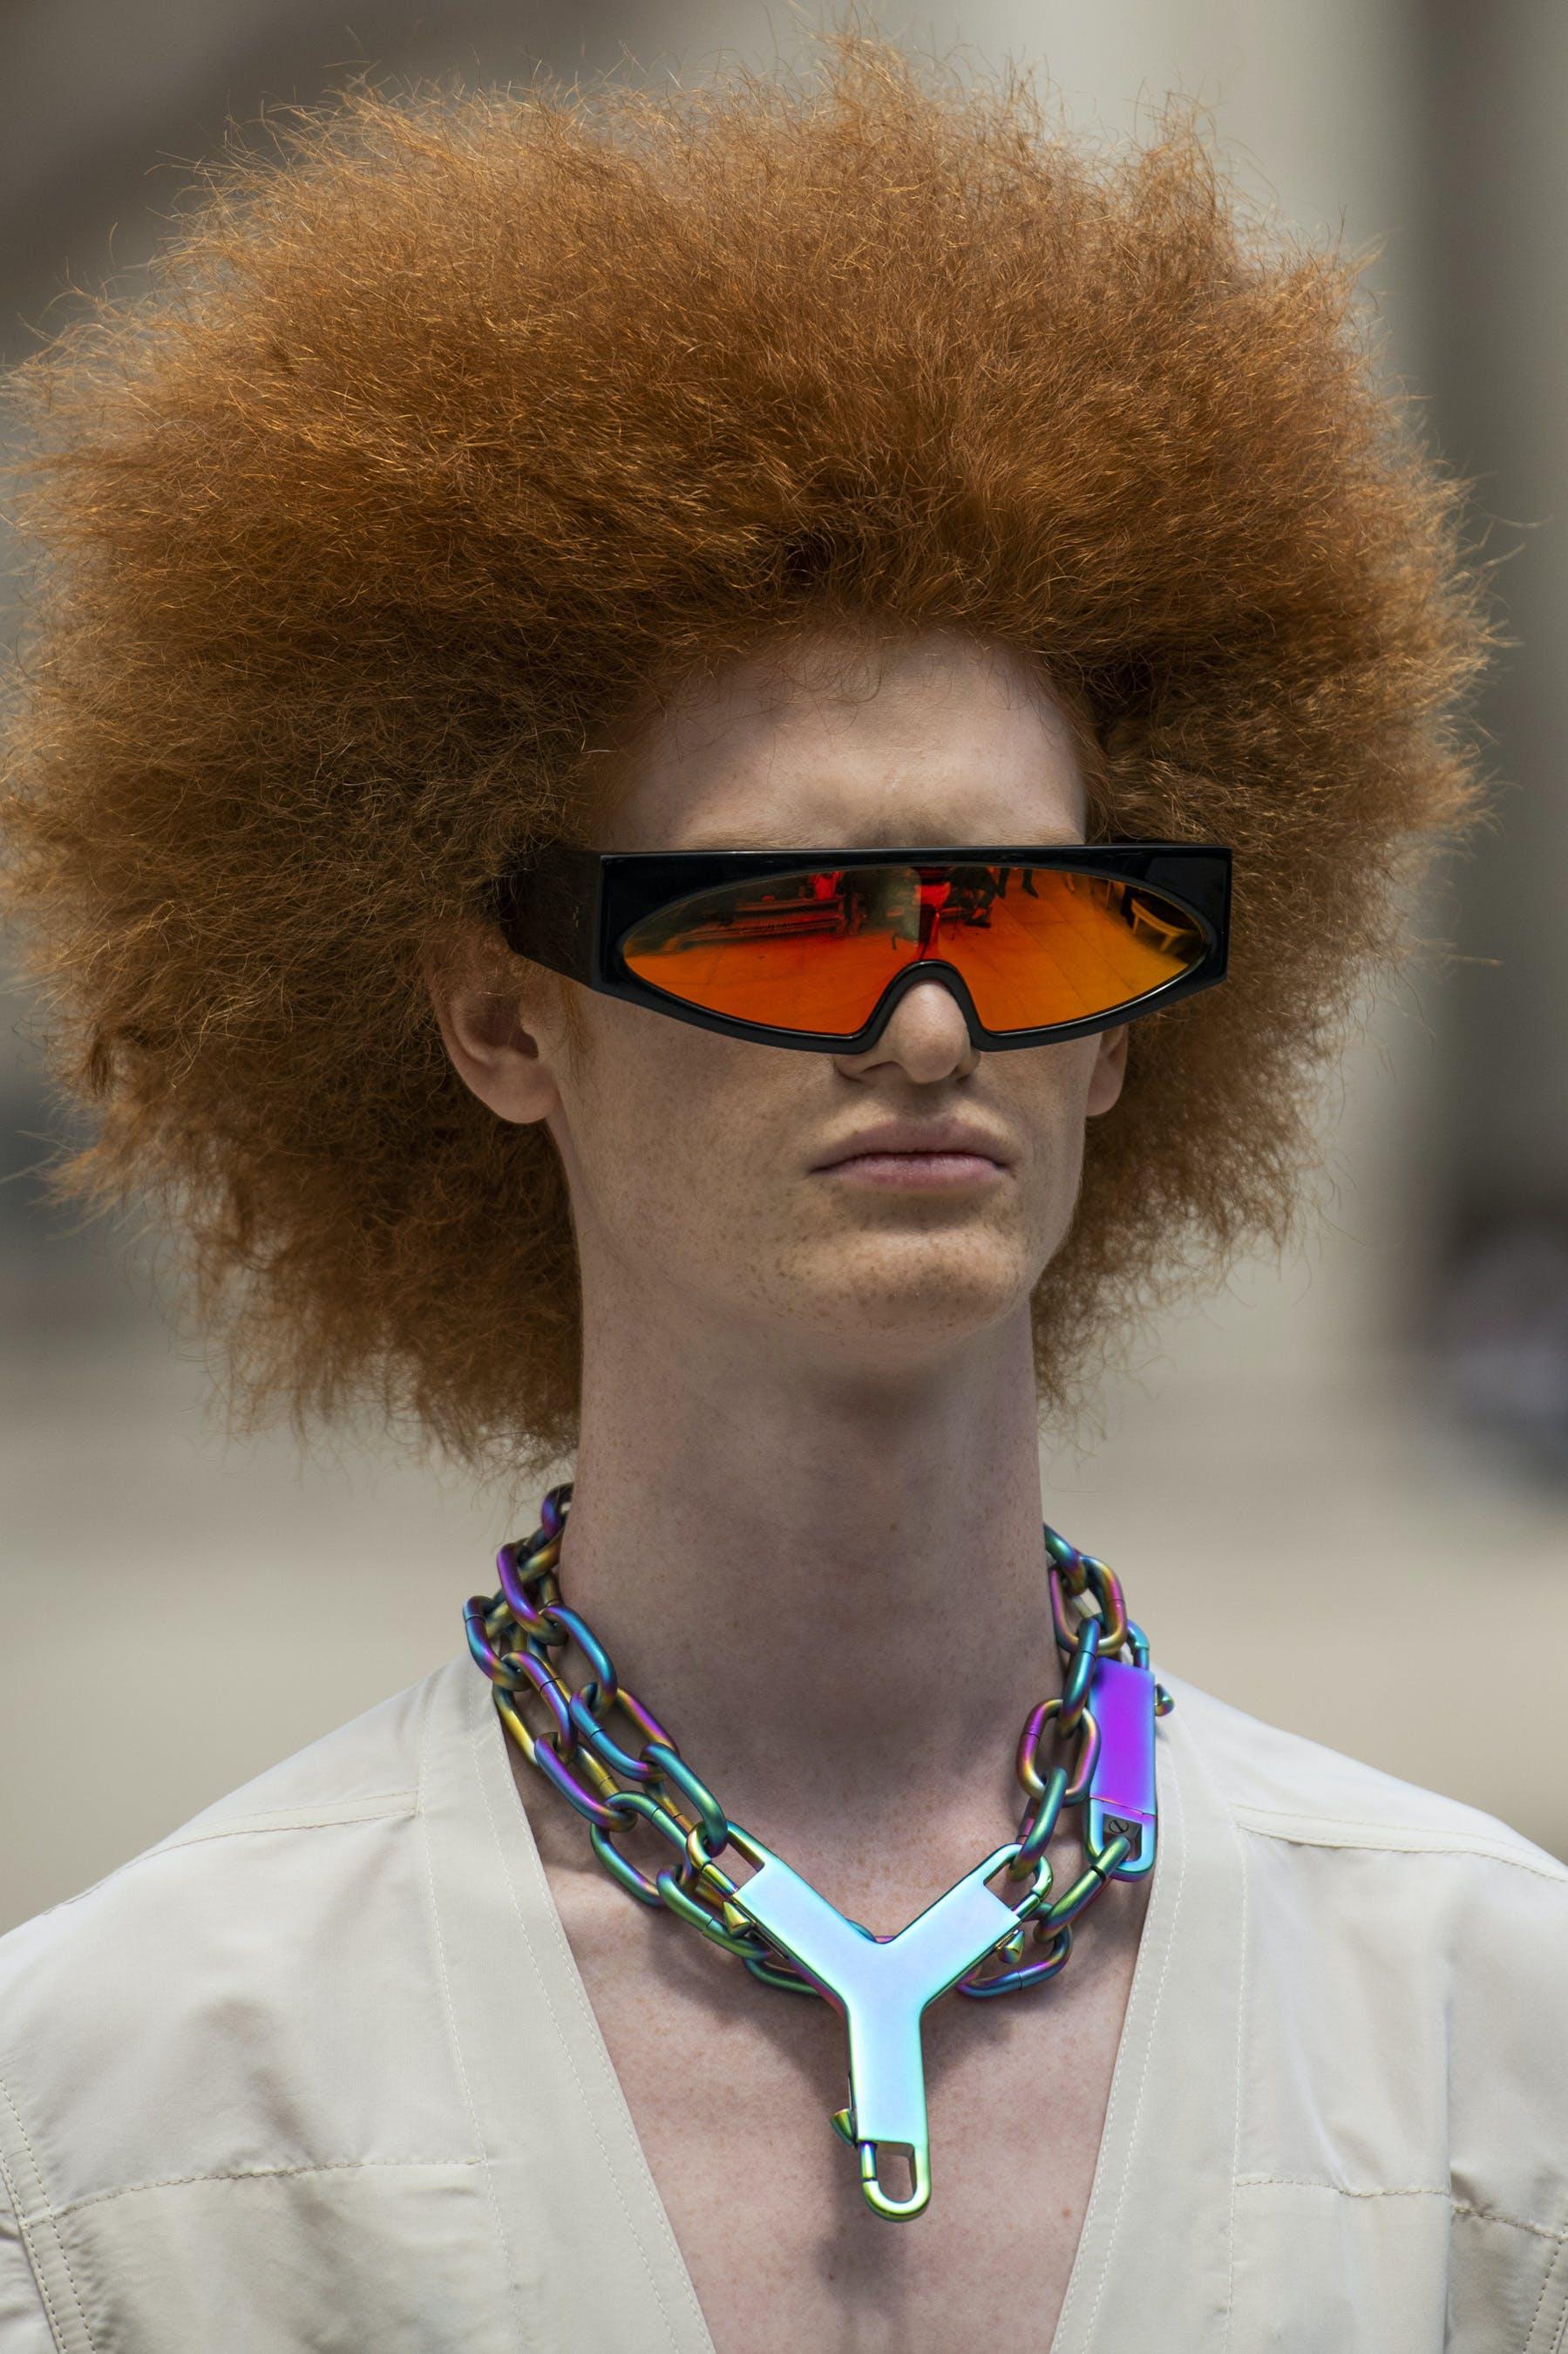 Rick Owens Runway Details Retro Futuristic Black Rectangular Framed Sunglasses Red Reflective Lenses Larry Shirt In White Mens SS20 Tecautl